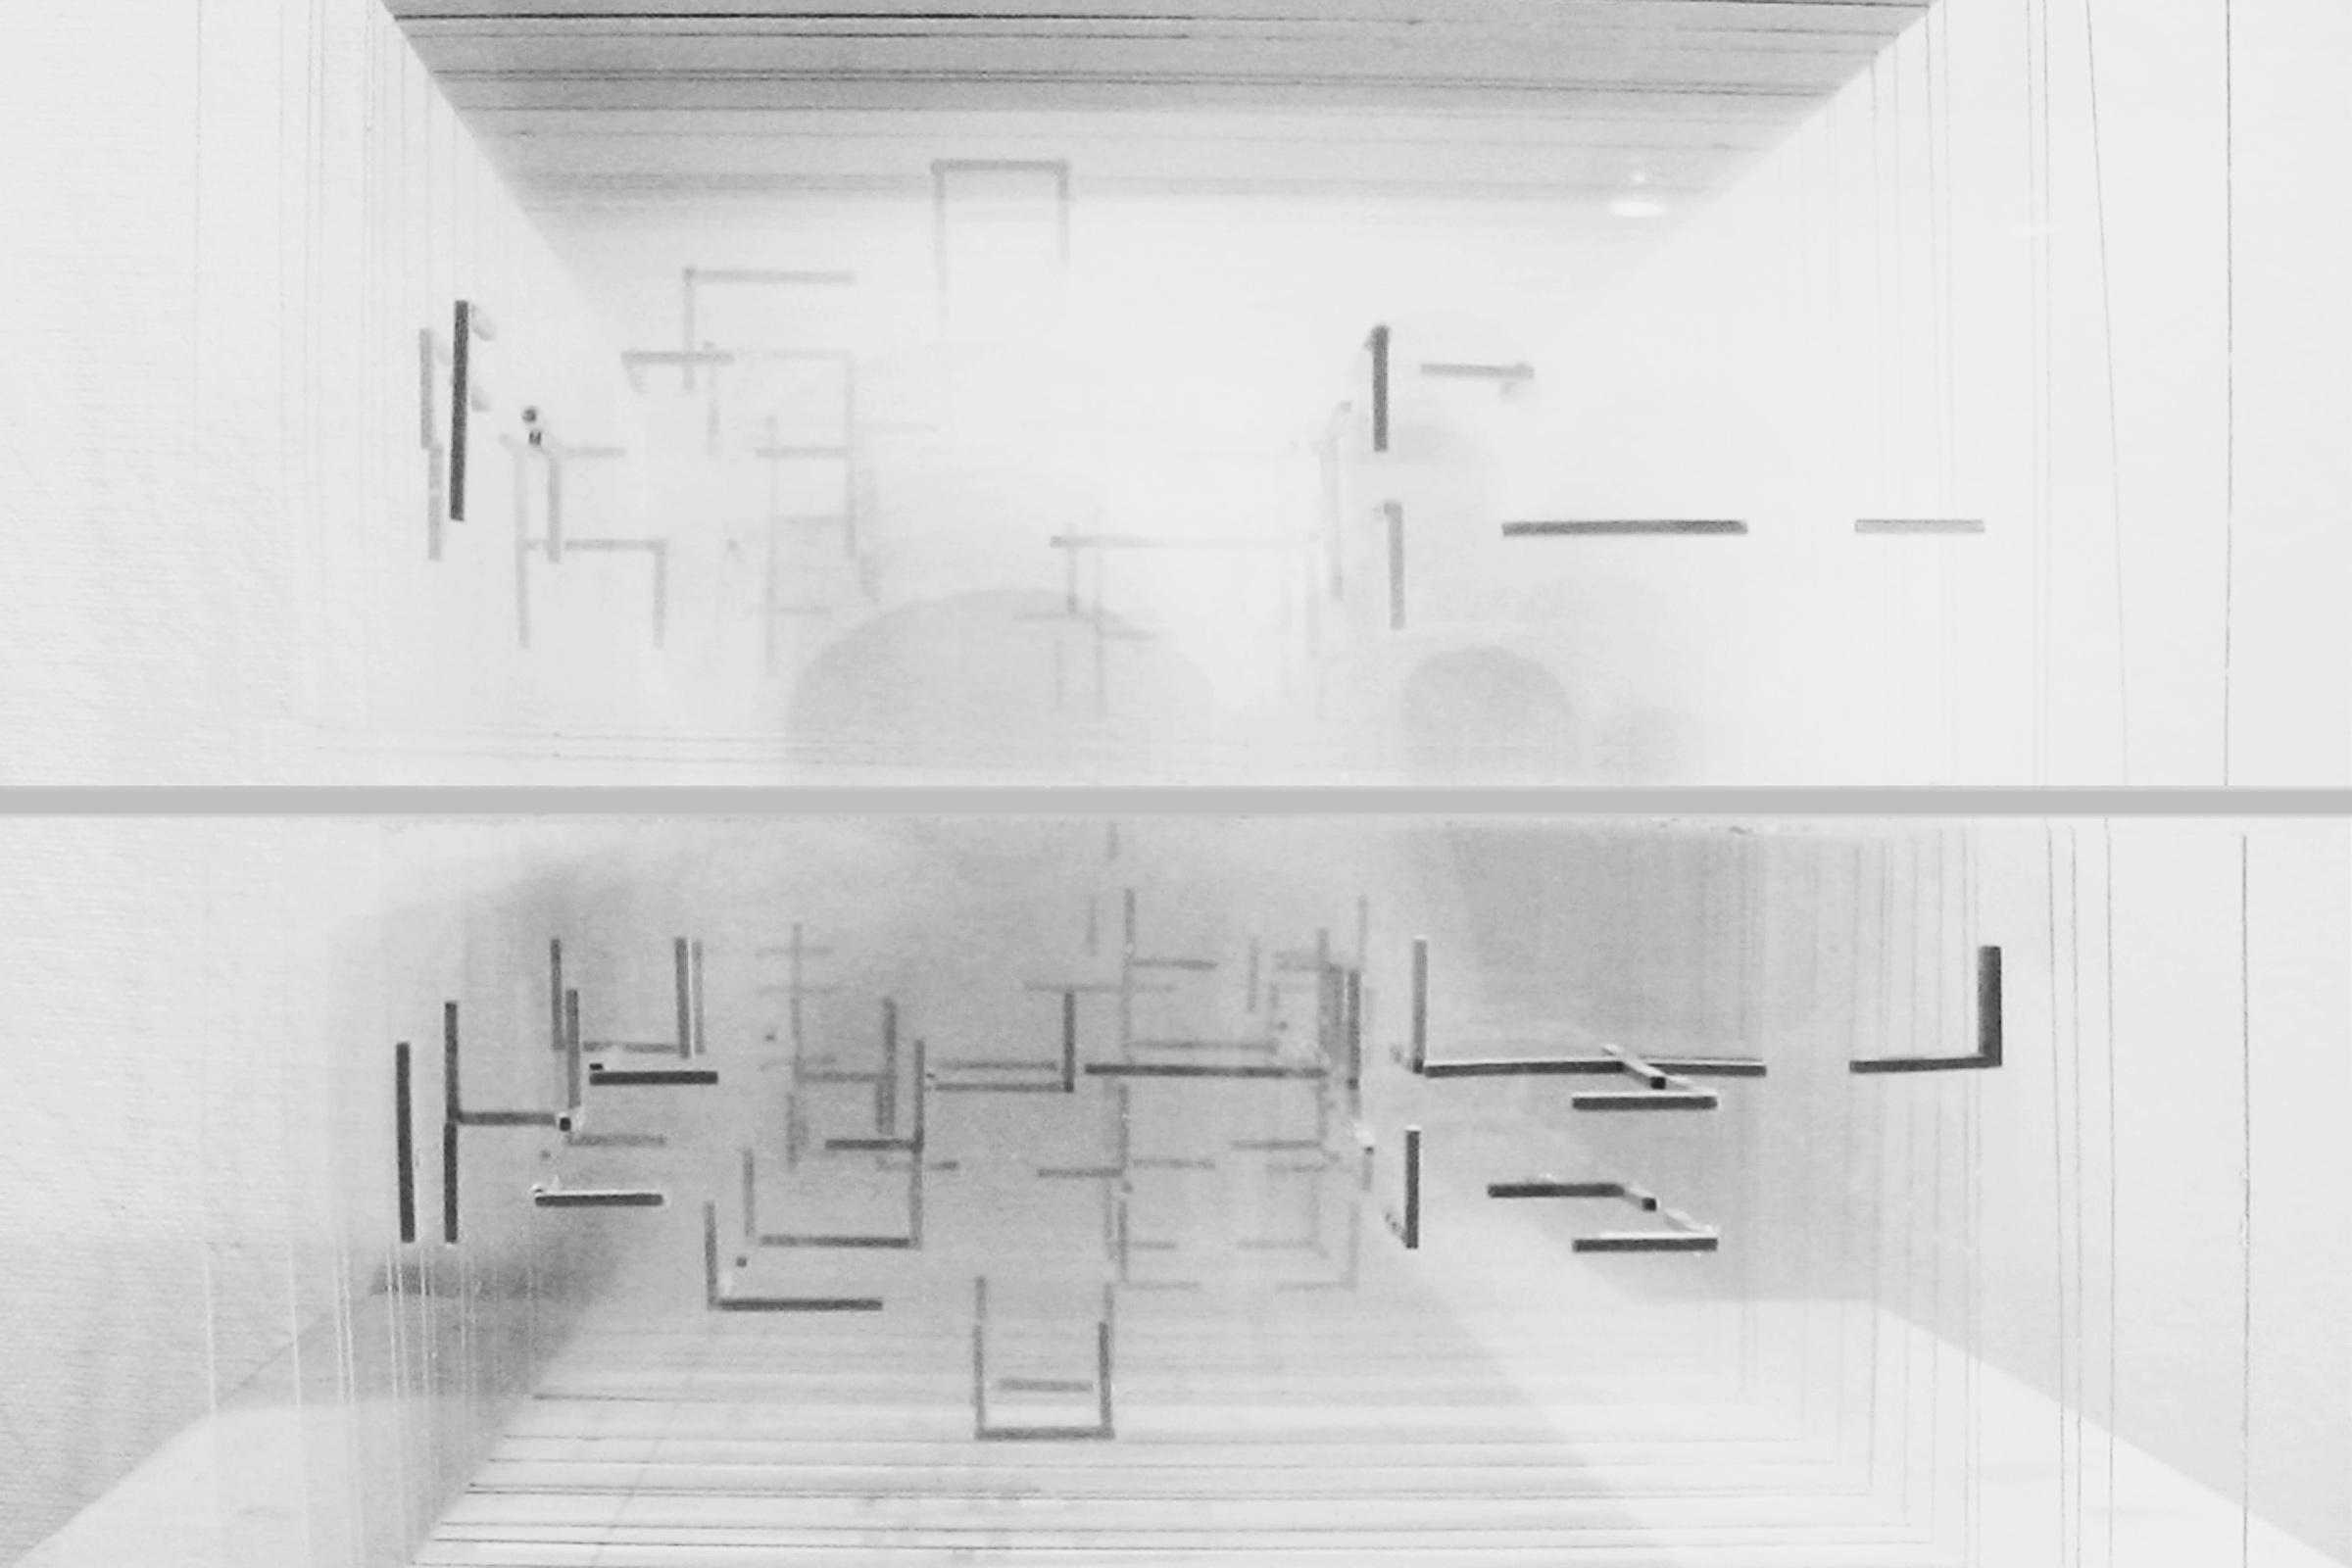 Mies Remix. Model, elevation